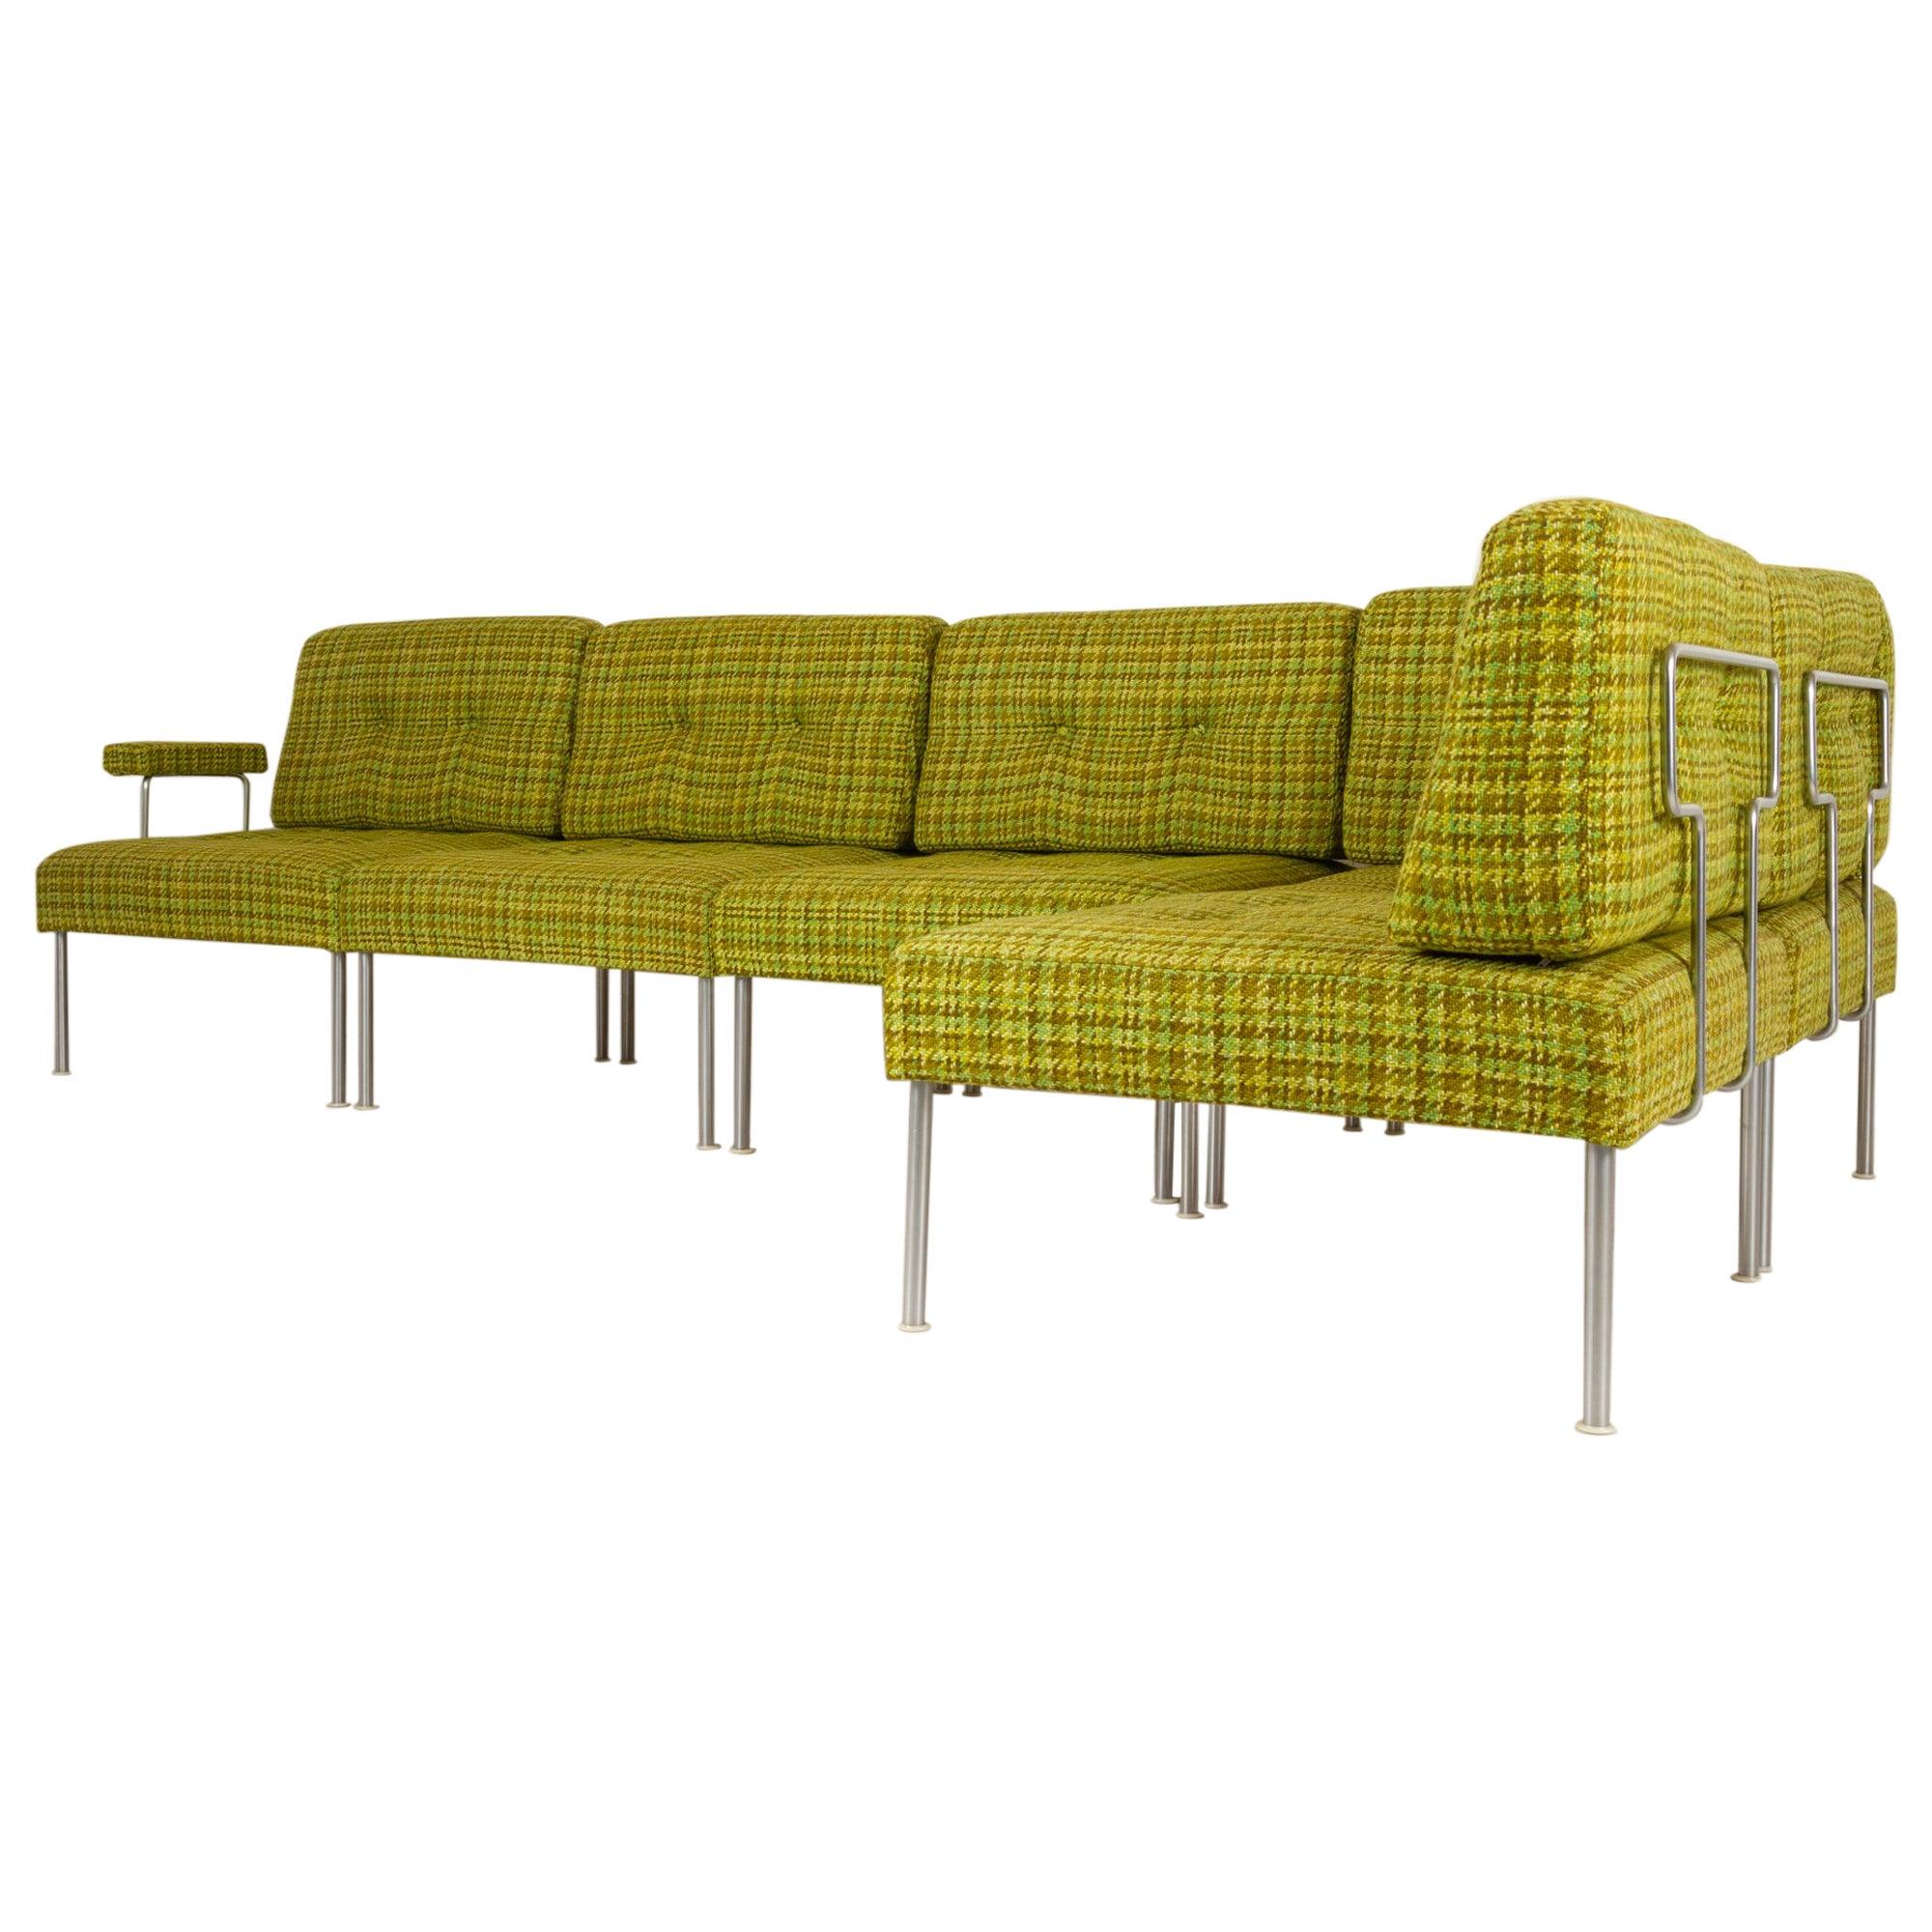 Vintage Danish Modular Revolte Sofa by Poul Cadovius for Cado, 1970s